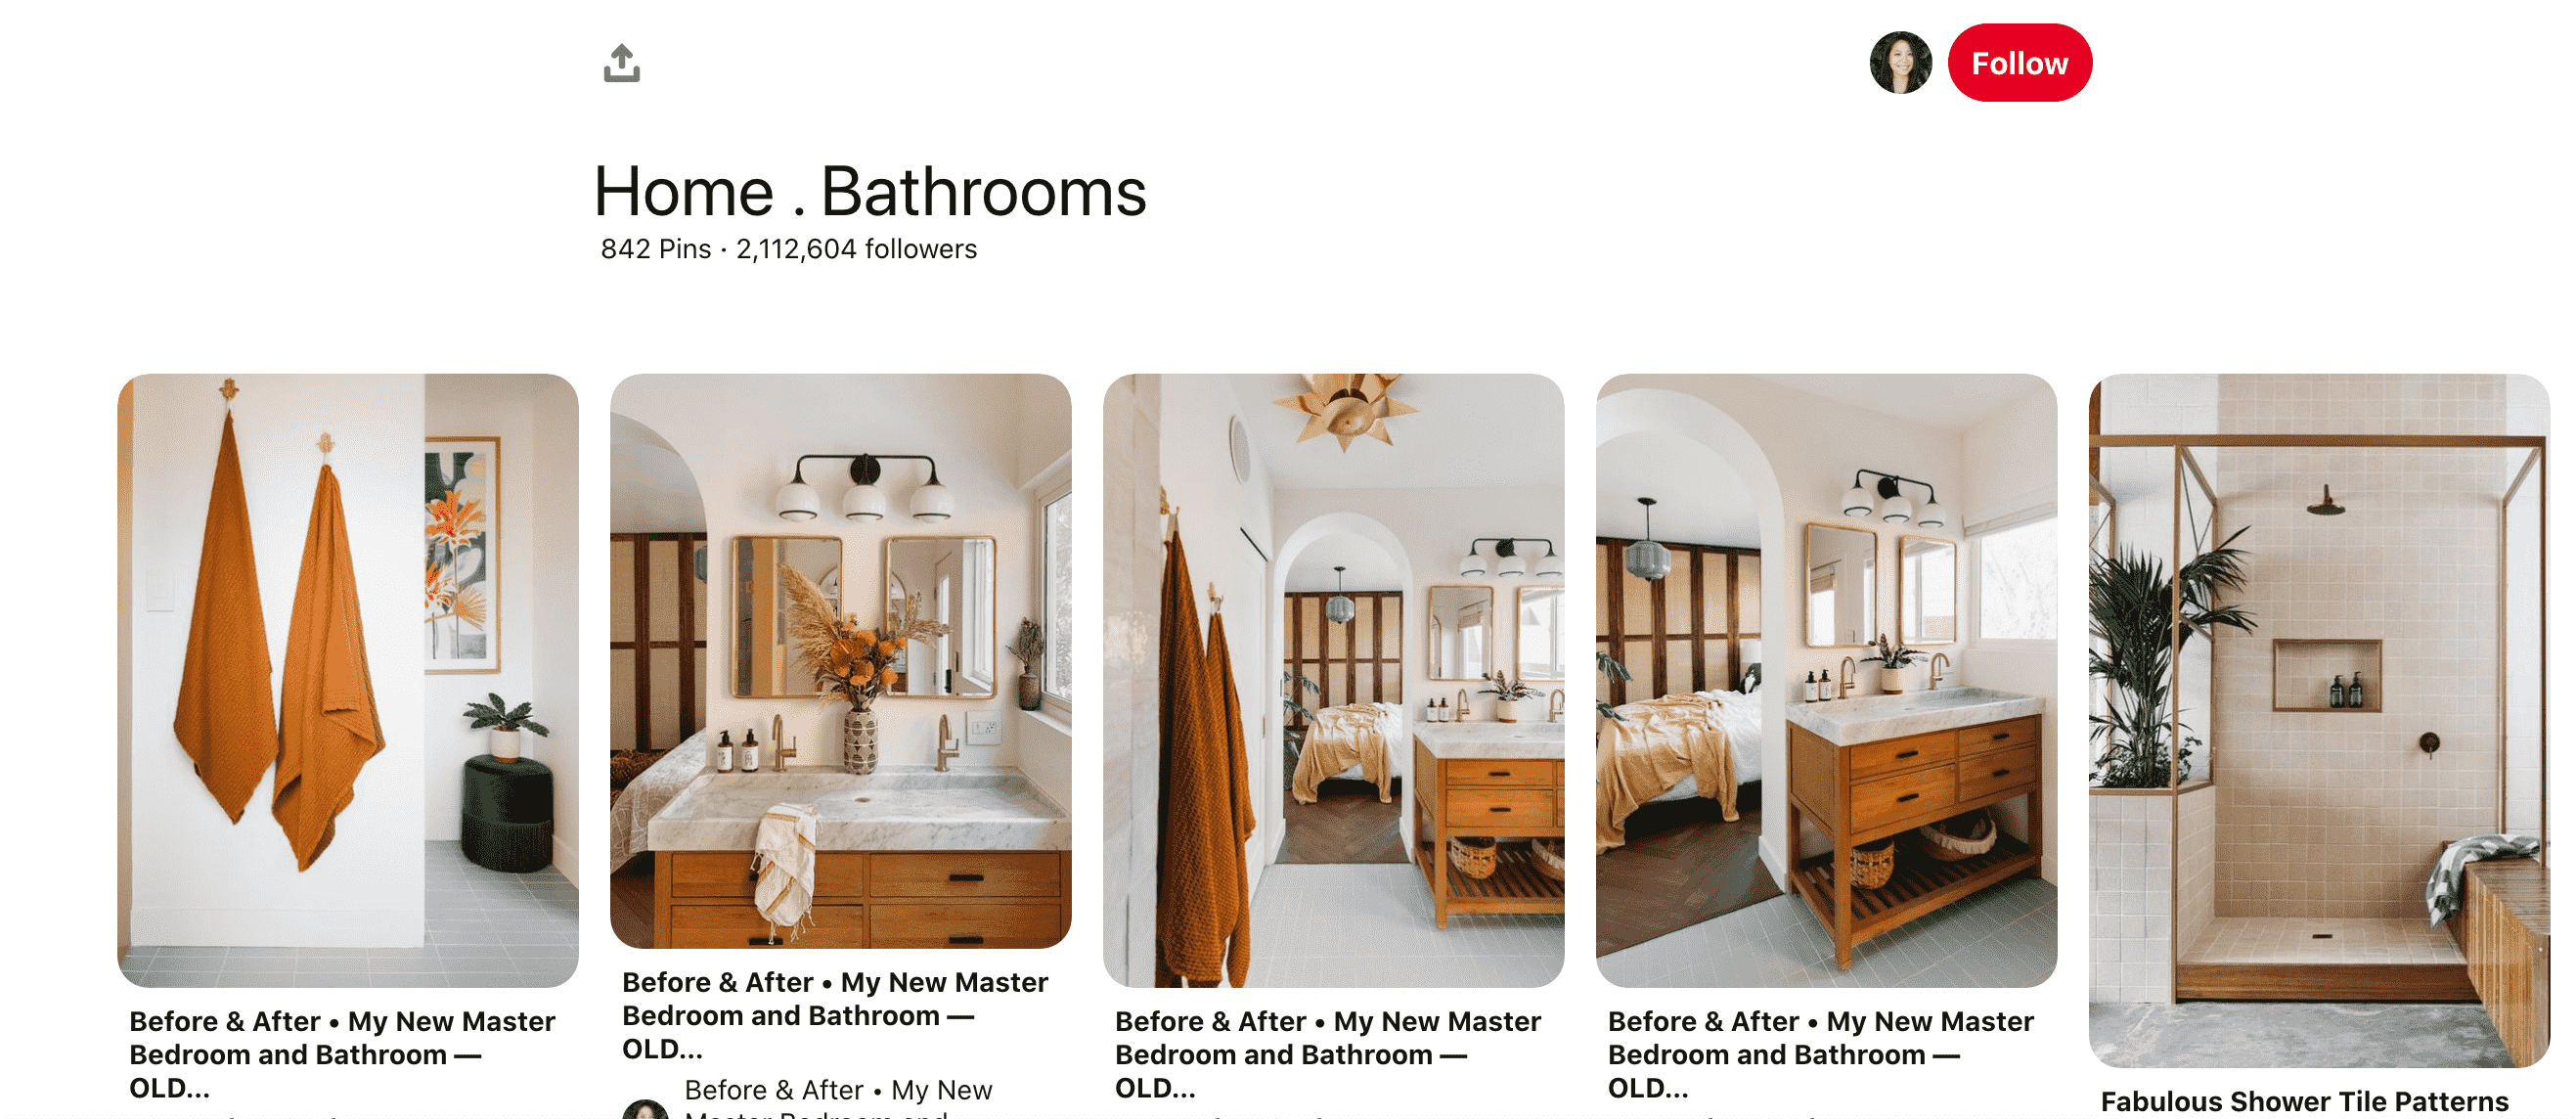 Home- Bathroom Board